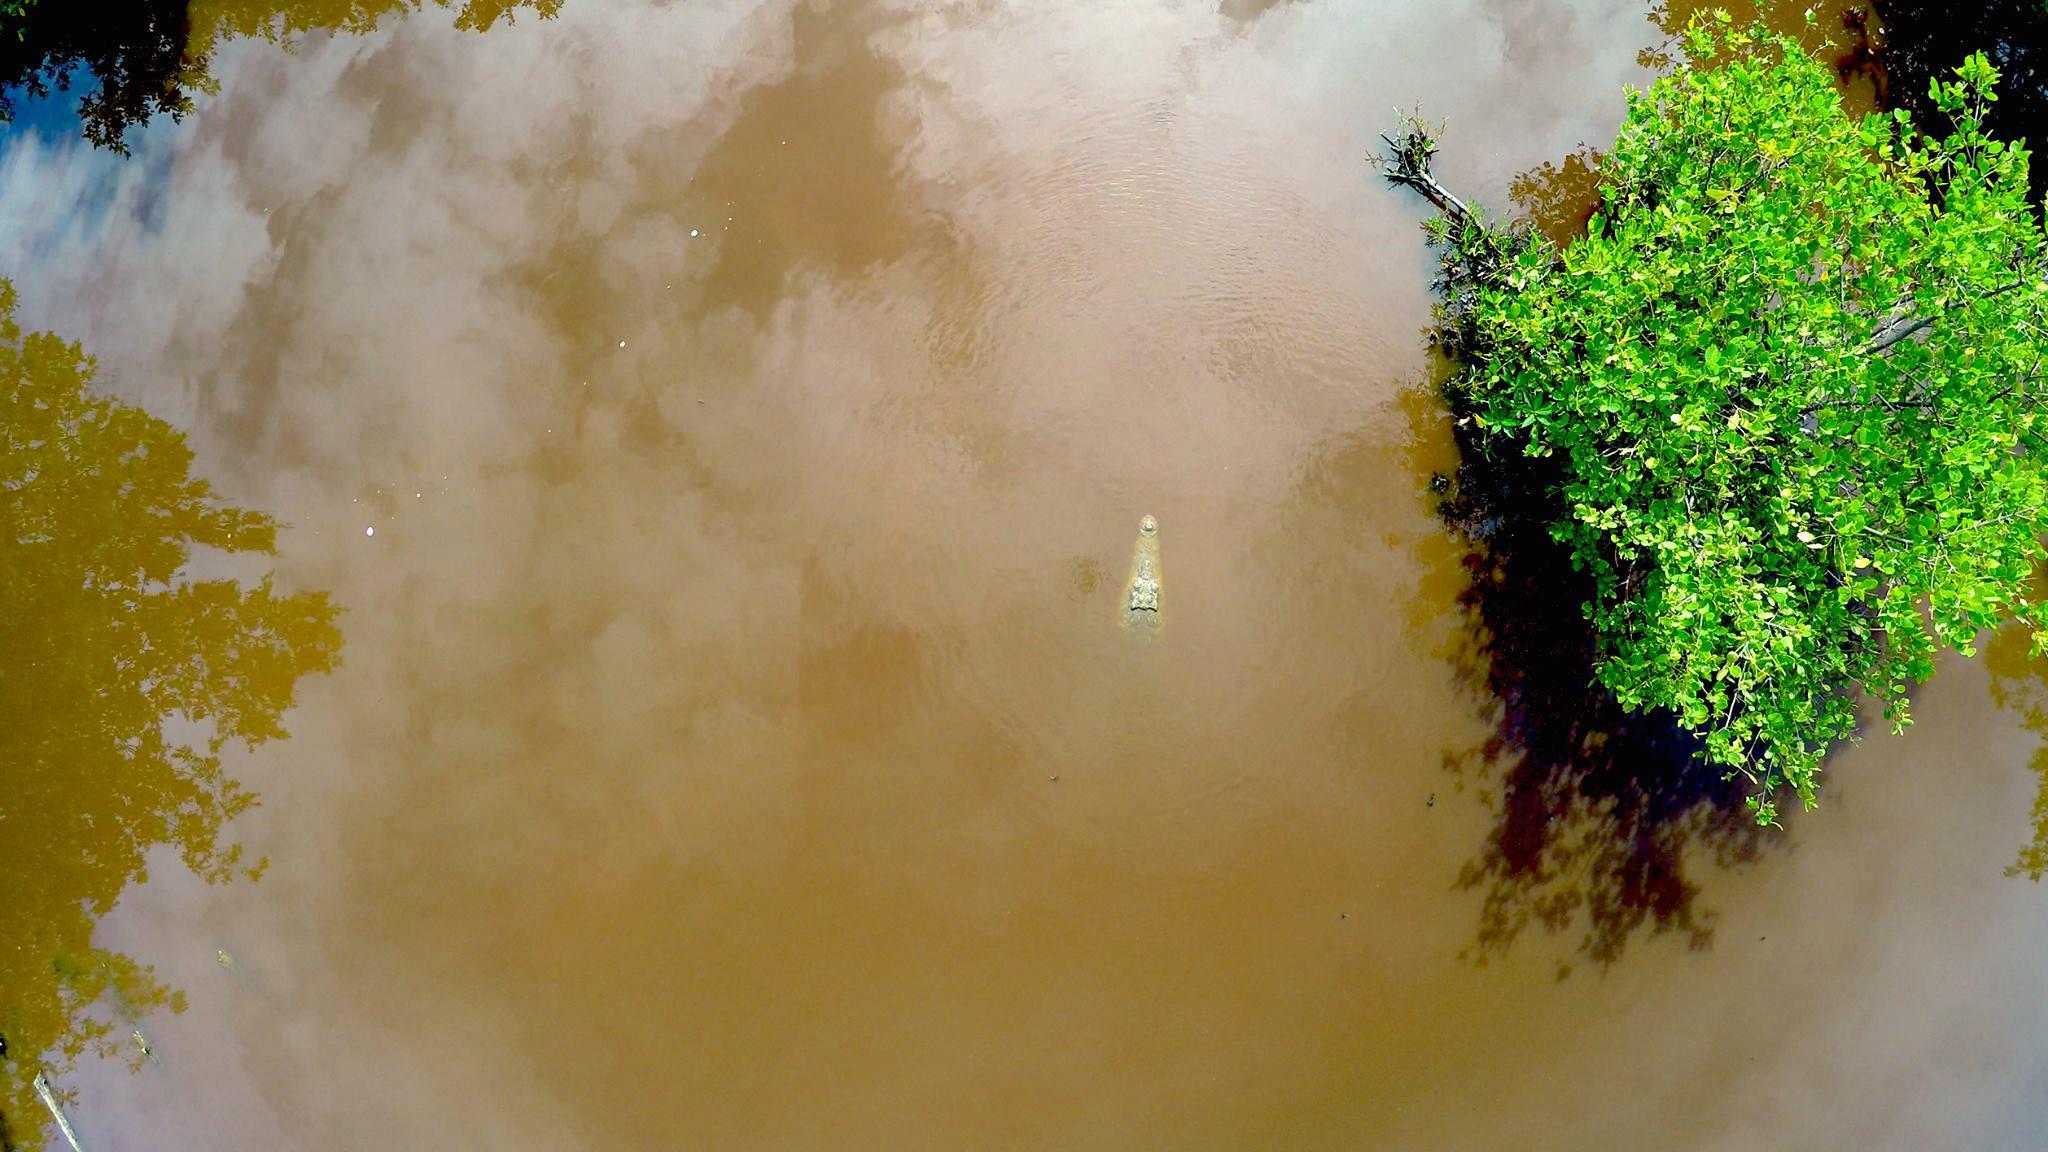 Blackbird Caye and the murky lagoon where American crocodiles reside. © Eric Ramos